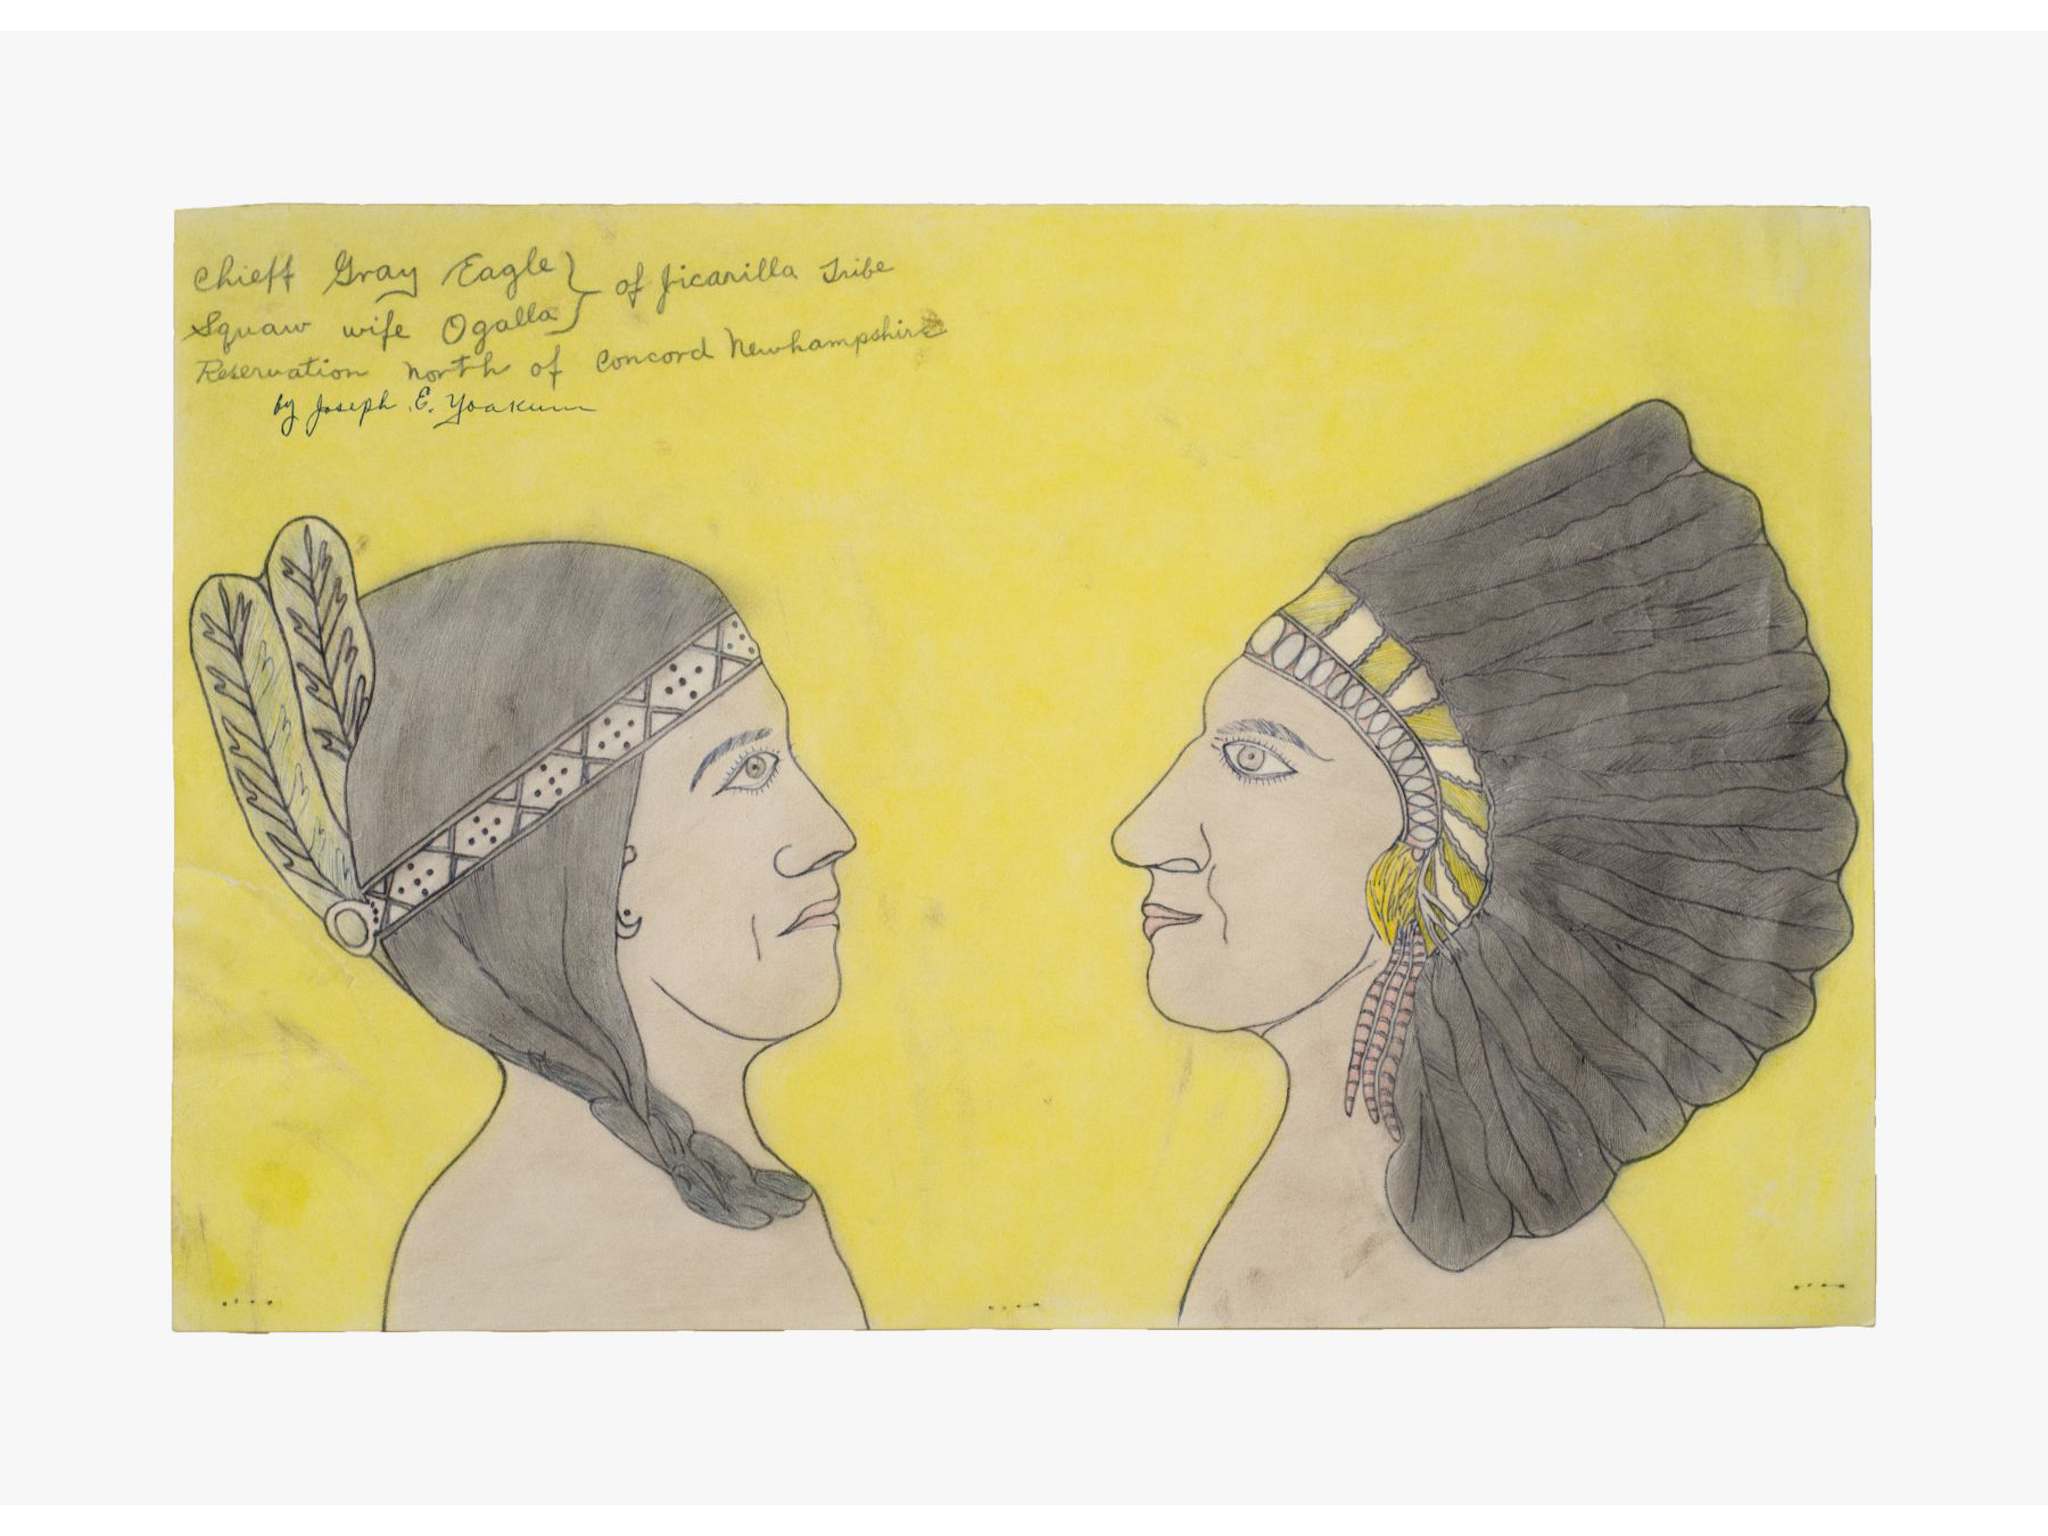 Joseph Elmer Yoakum, Chieff Gray Eagle Squaw wife Ogalla of Jicarilla Tribe Reservation of Concord New Hampshire, n.d.